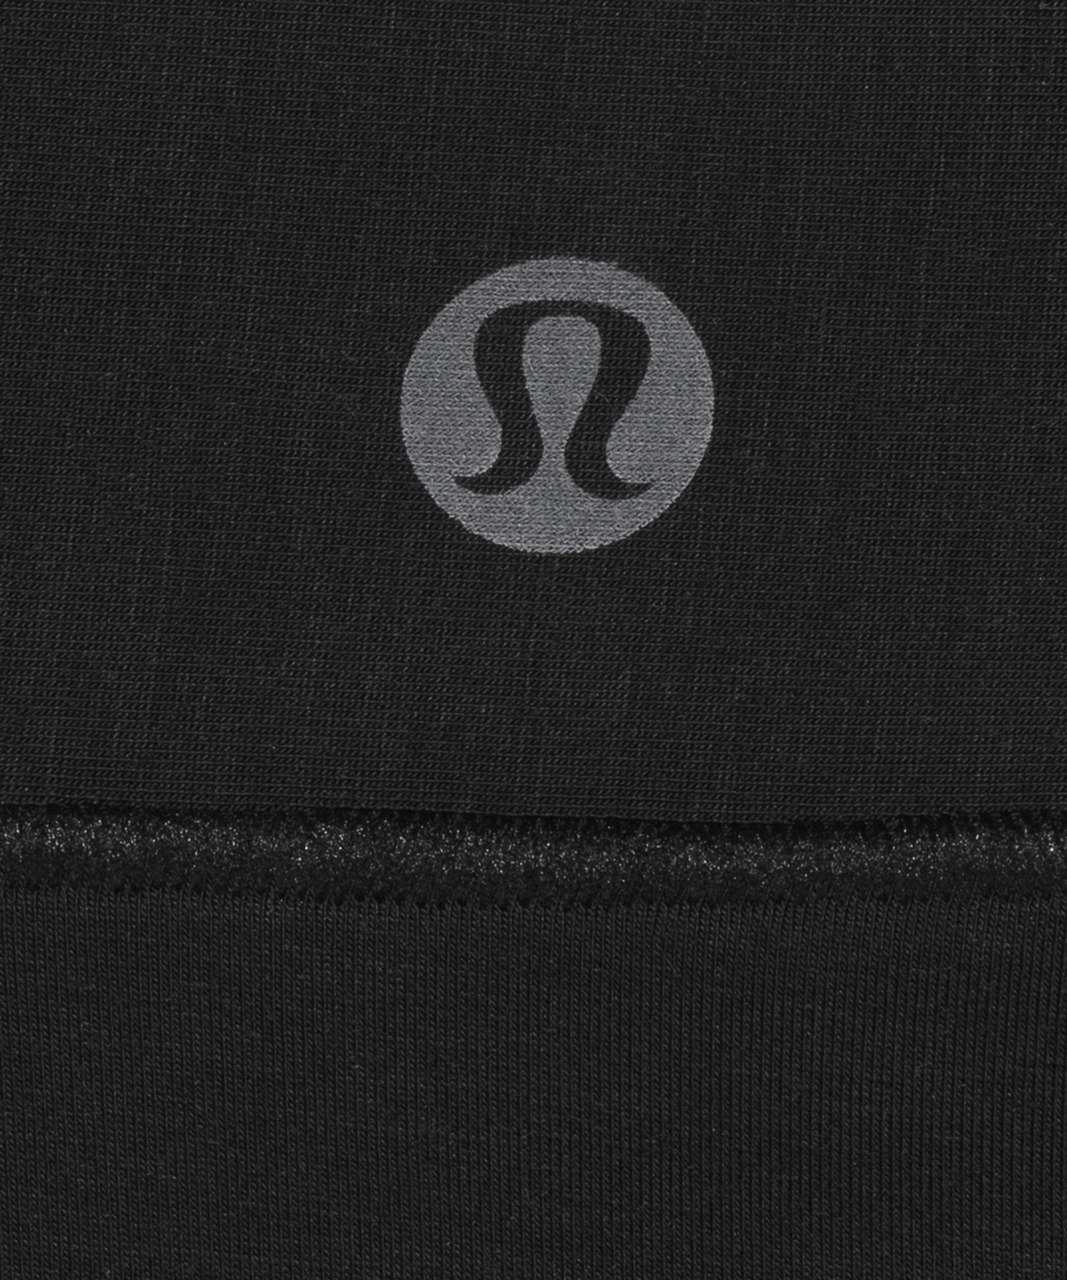 Lululemon UnderEase Mid Rise Thong Underwear *5 Pack - Black